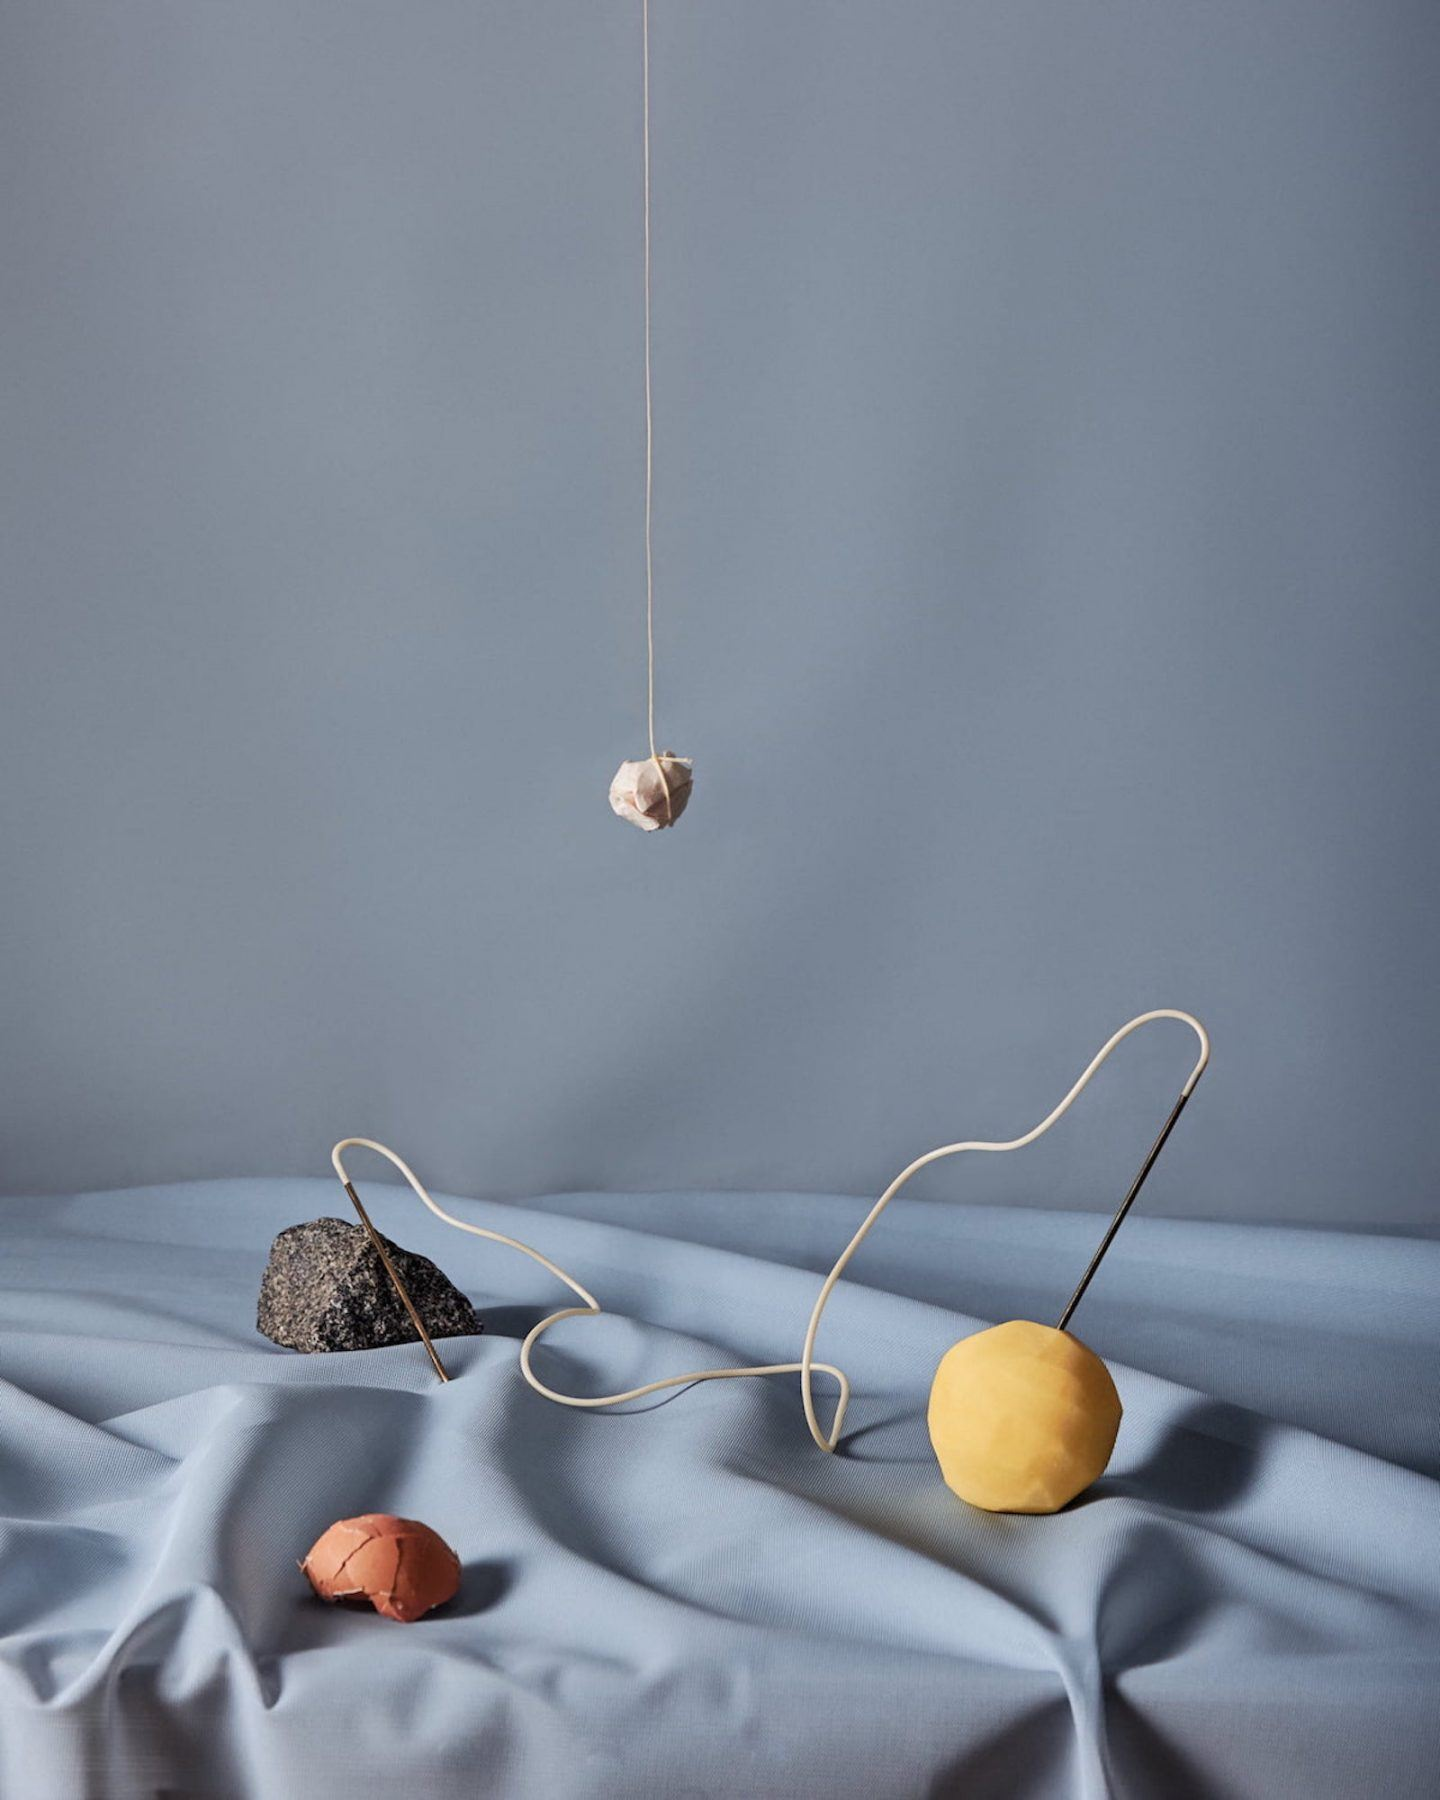 IGNANT-Photography-Studio-Holger-Kilumets-004